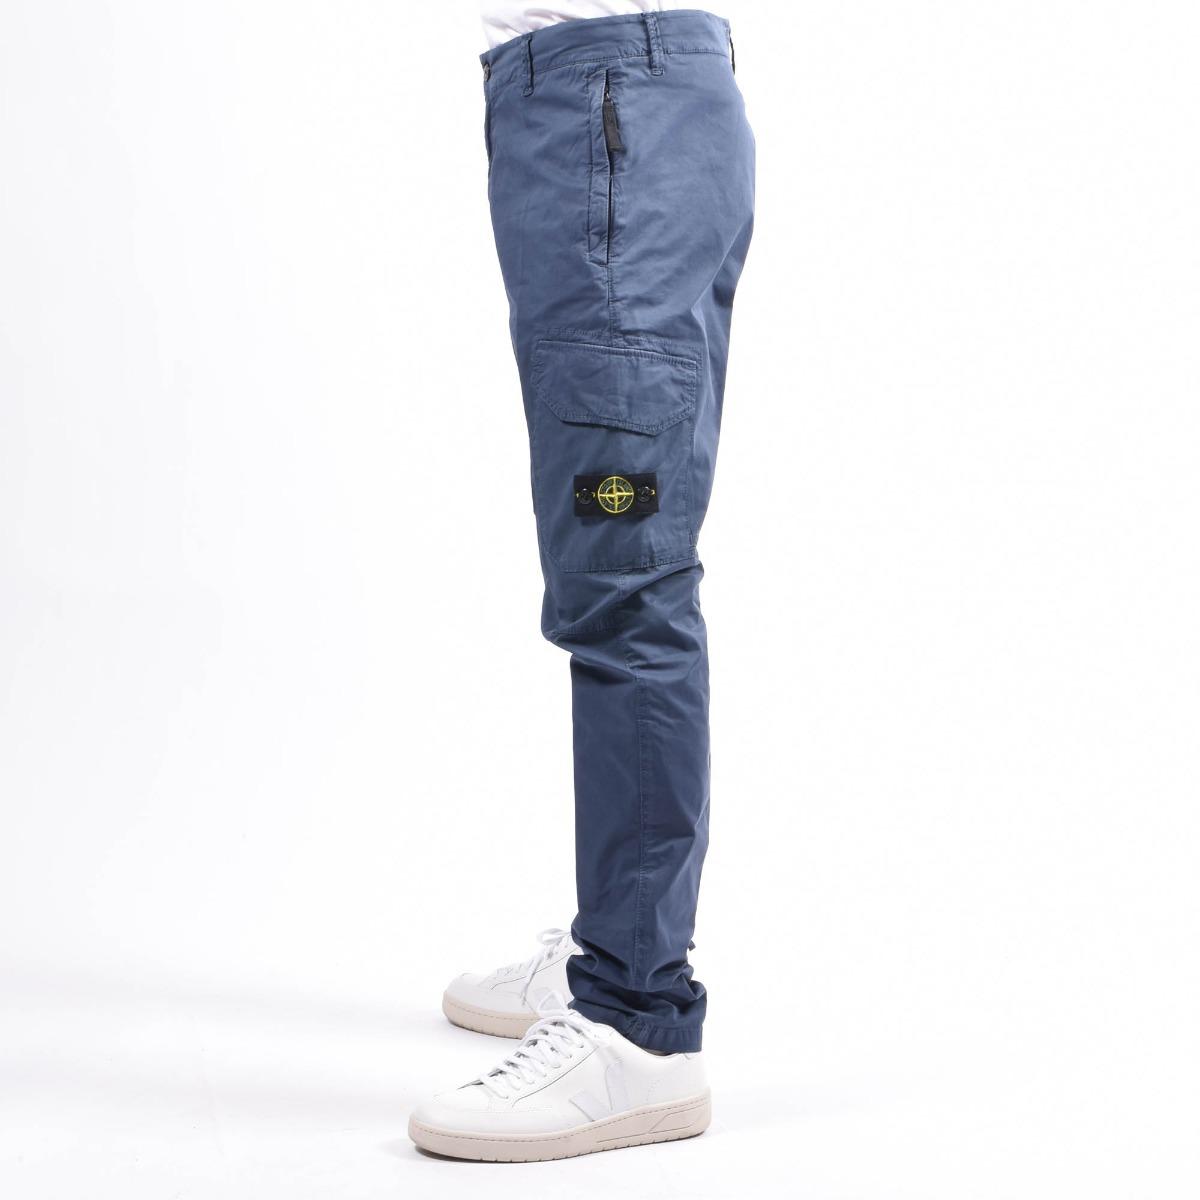 Pantaloni tasconato - Bluette